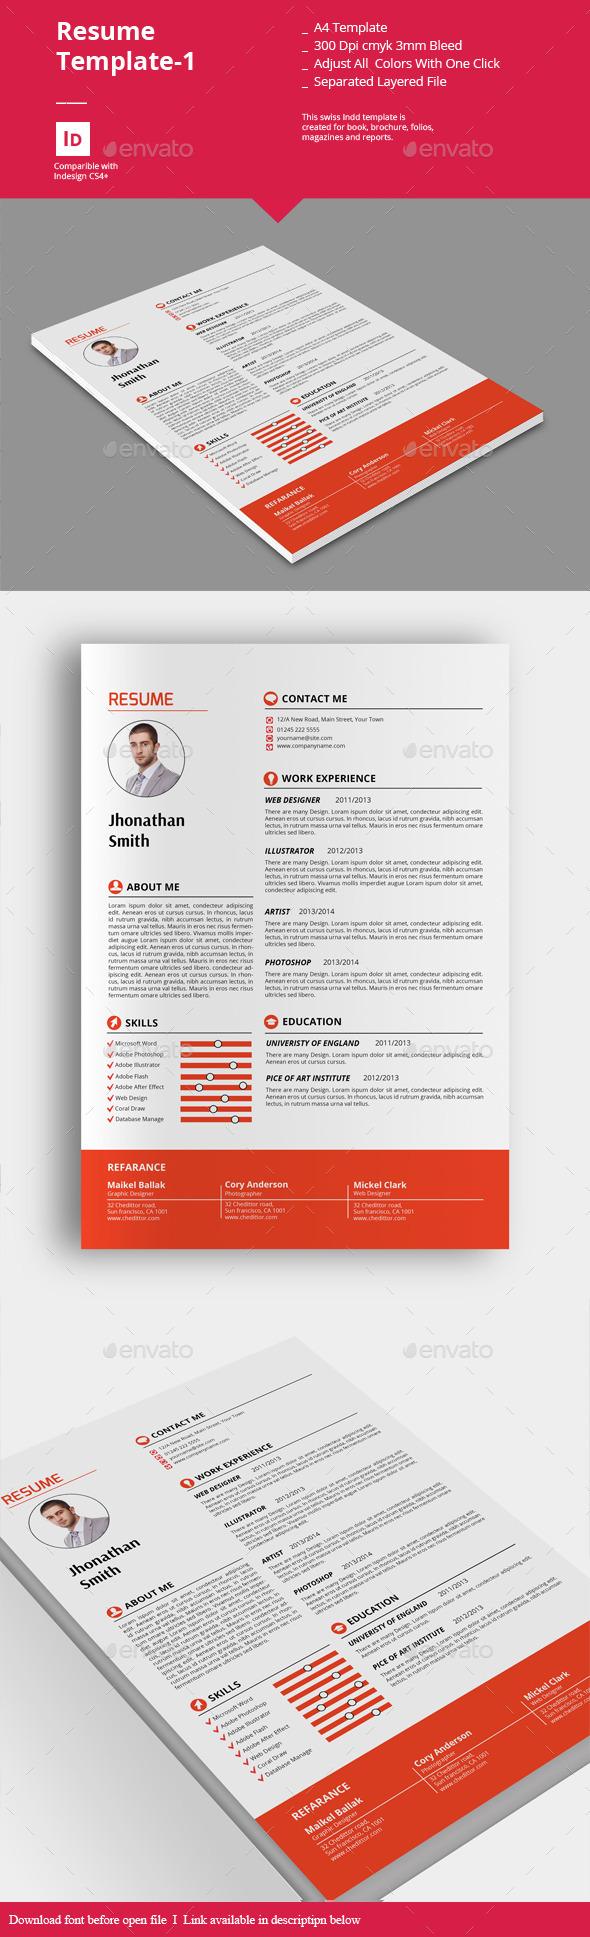 Resume Templates-1